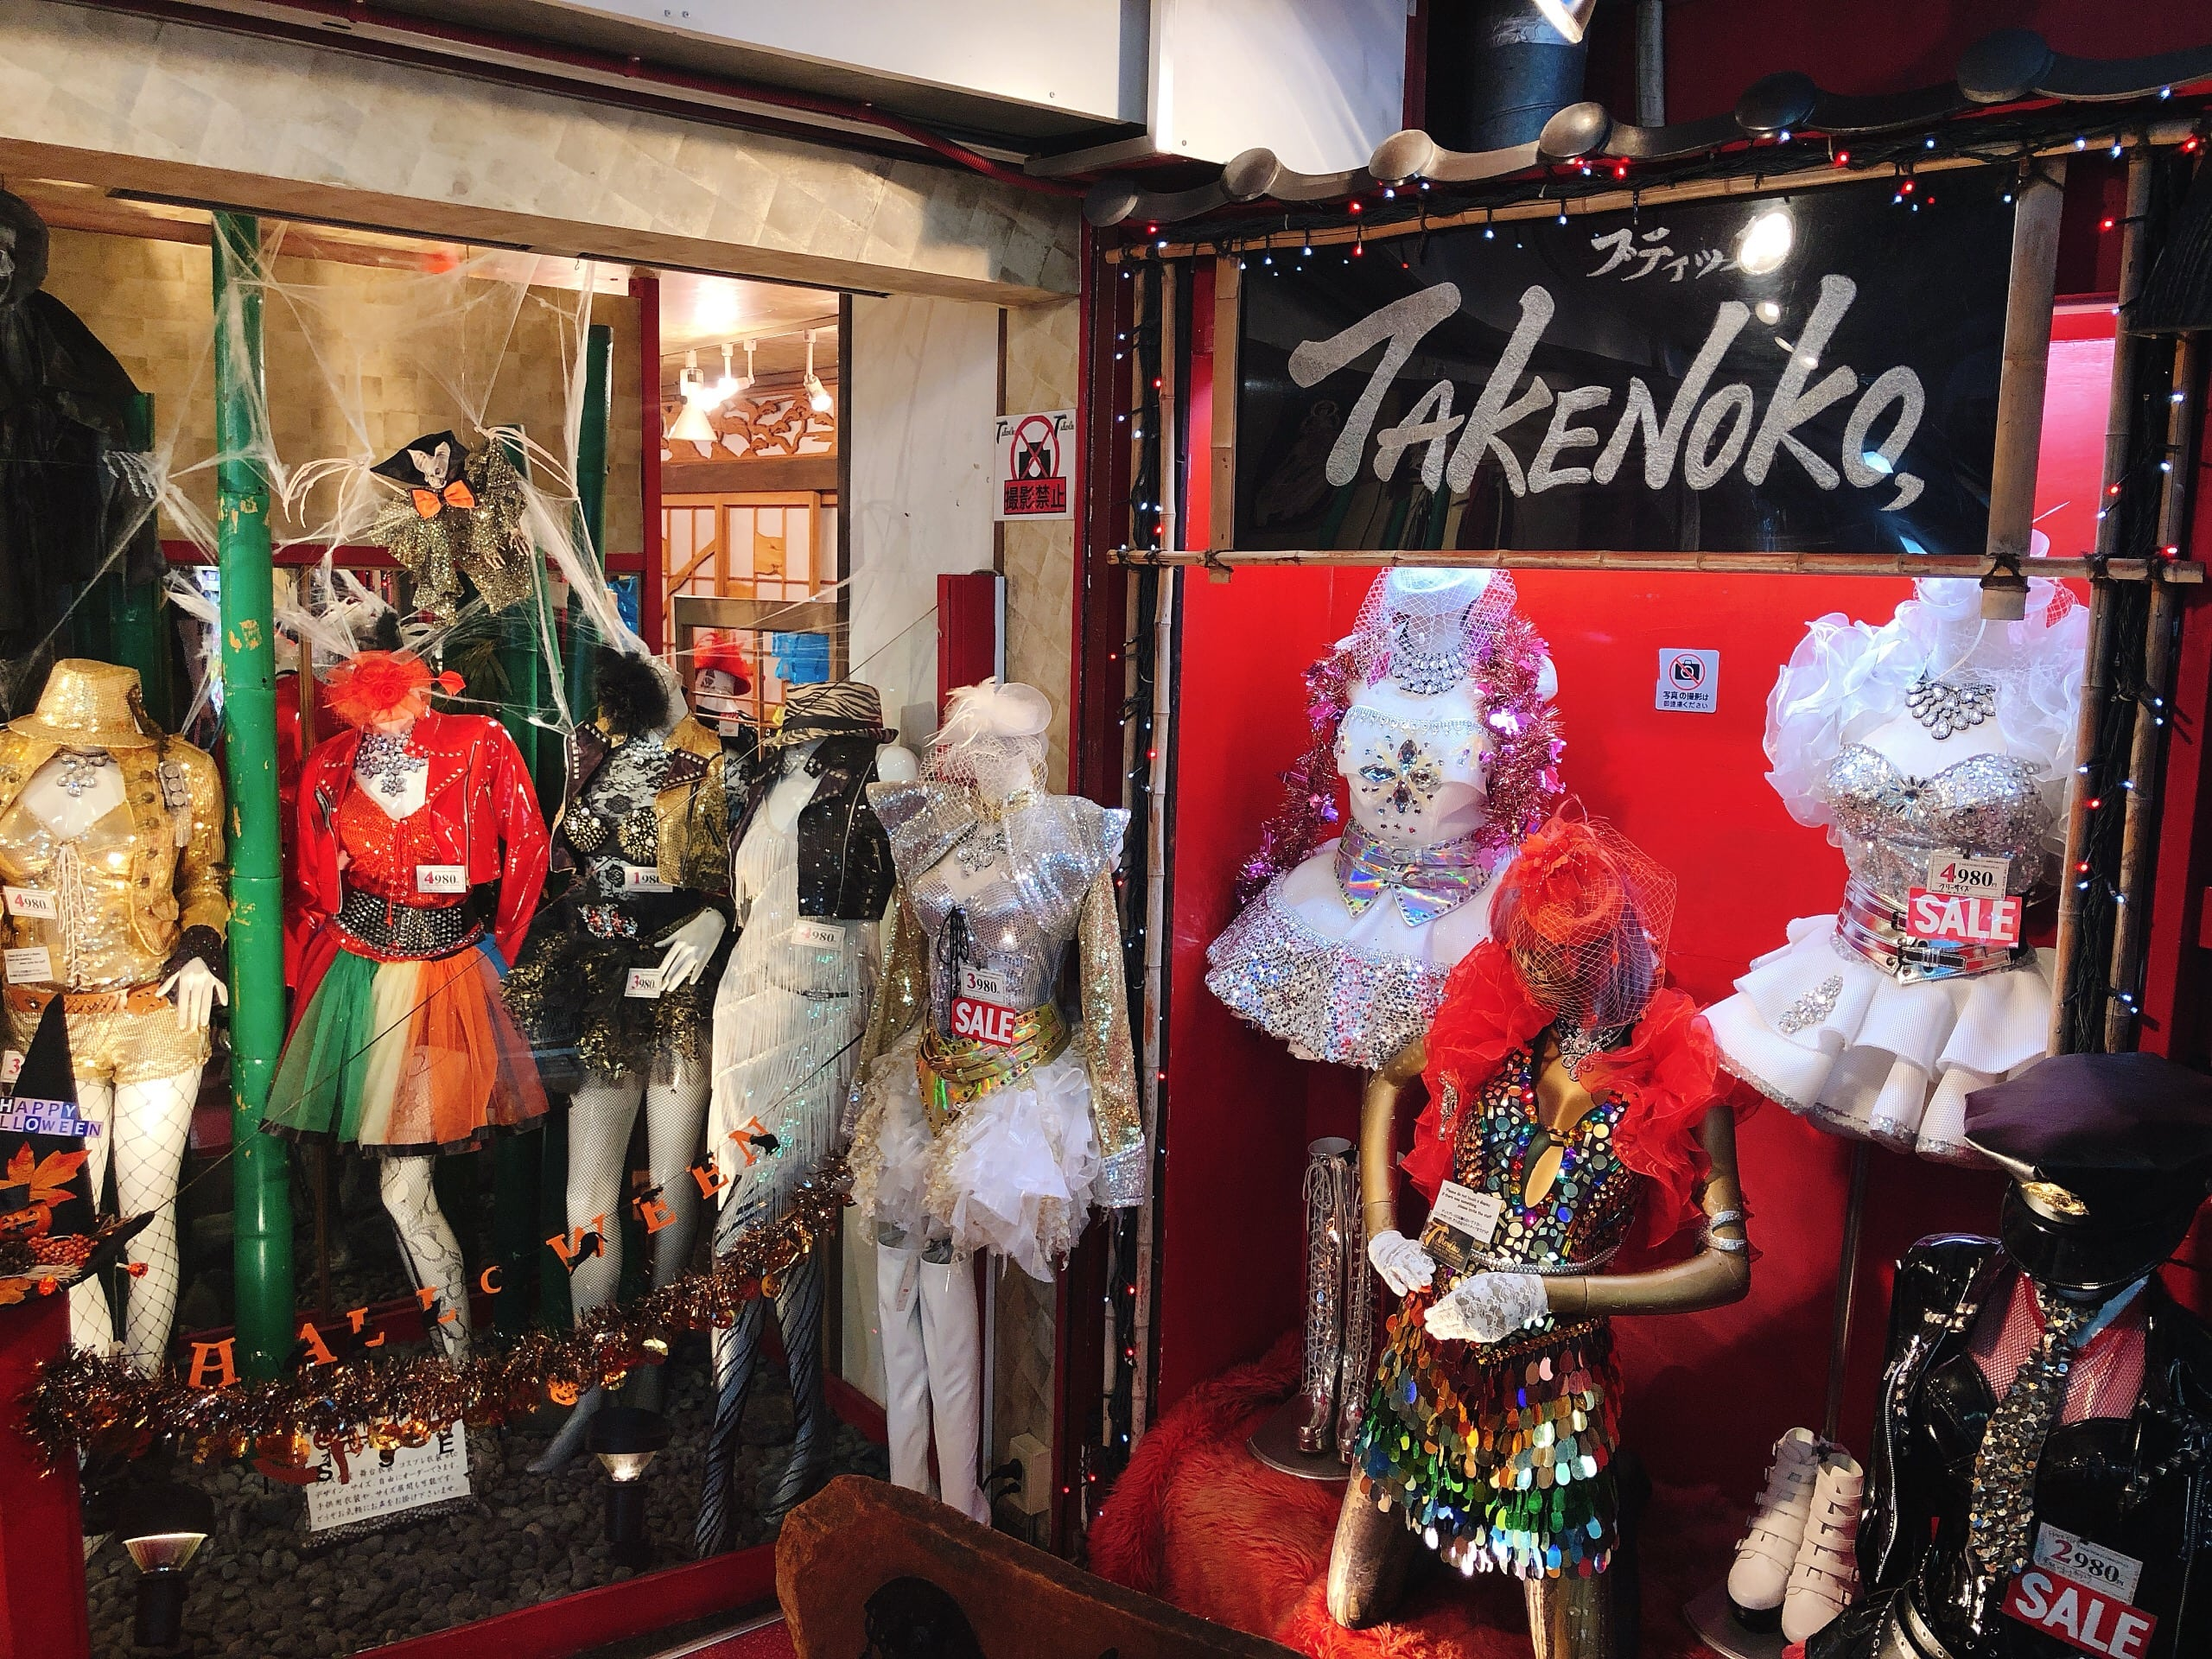 Kawaii fashion store at Takeshita Street, Harajuku